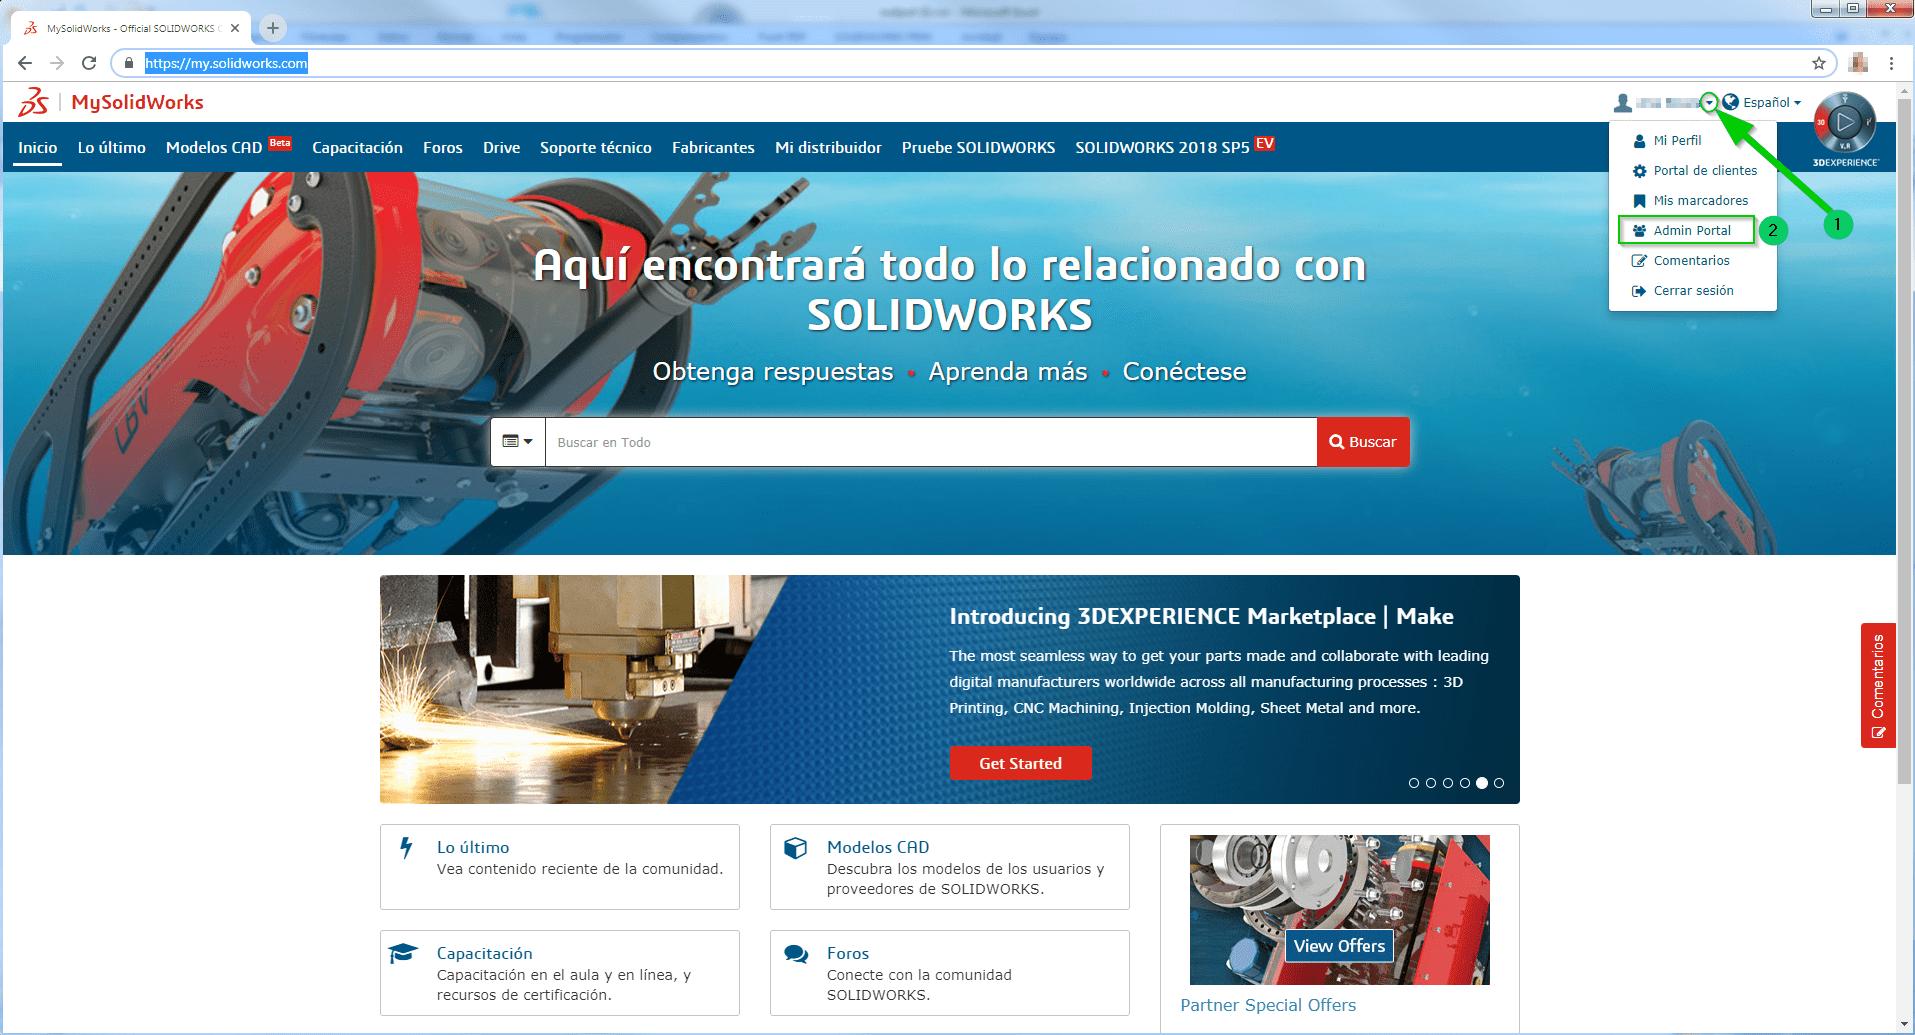 admin portal de mysolidworks